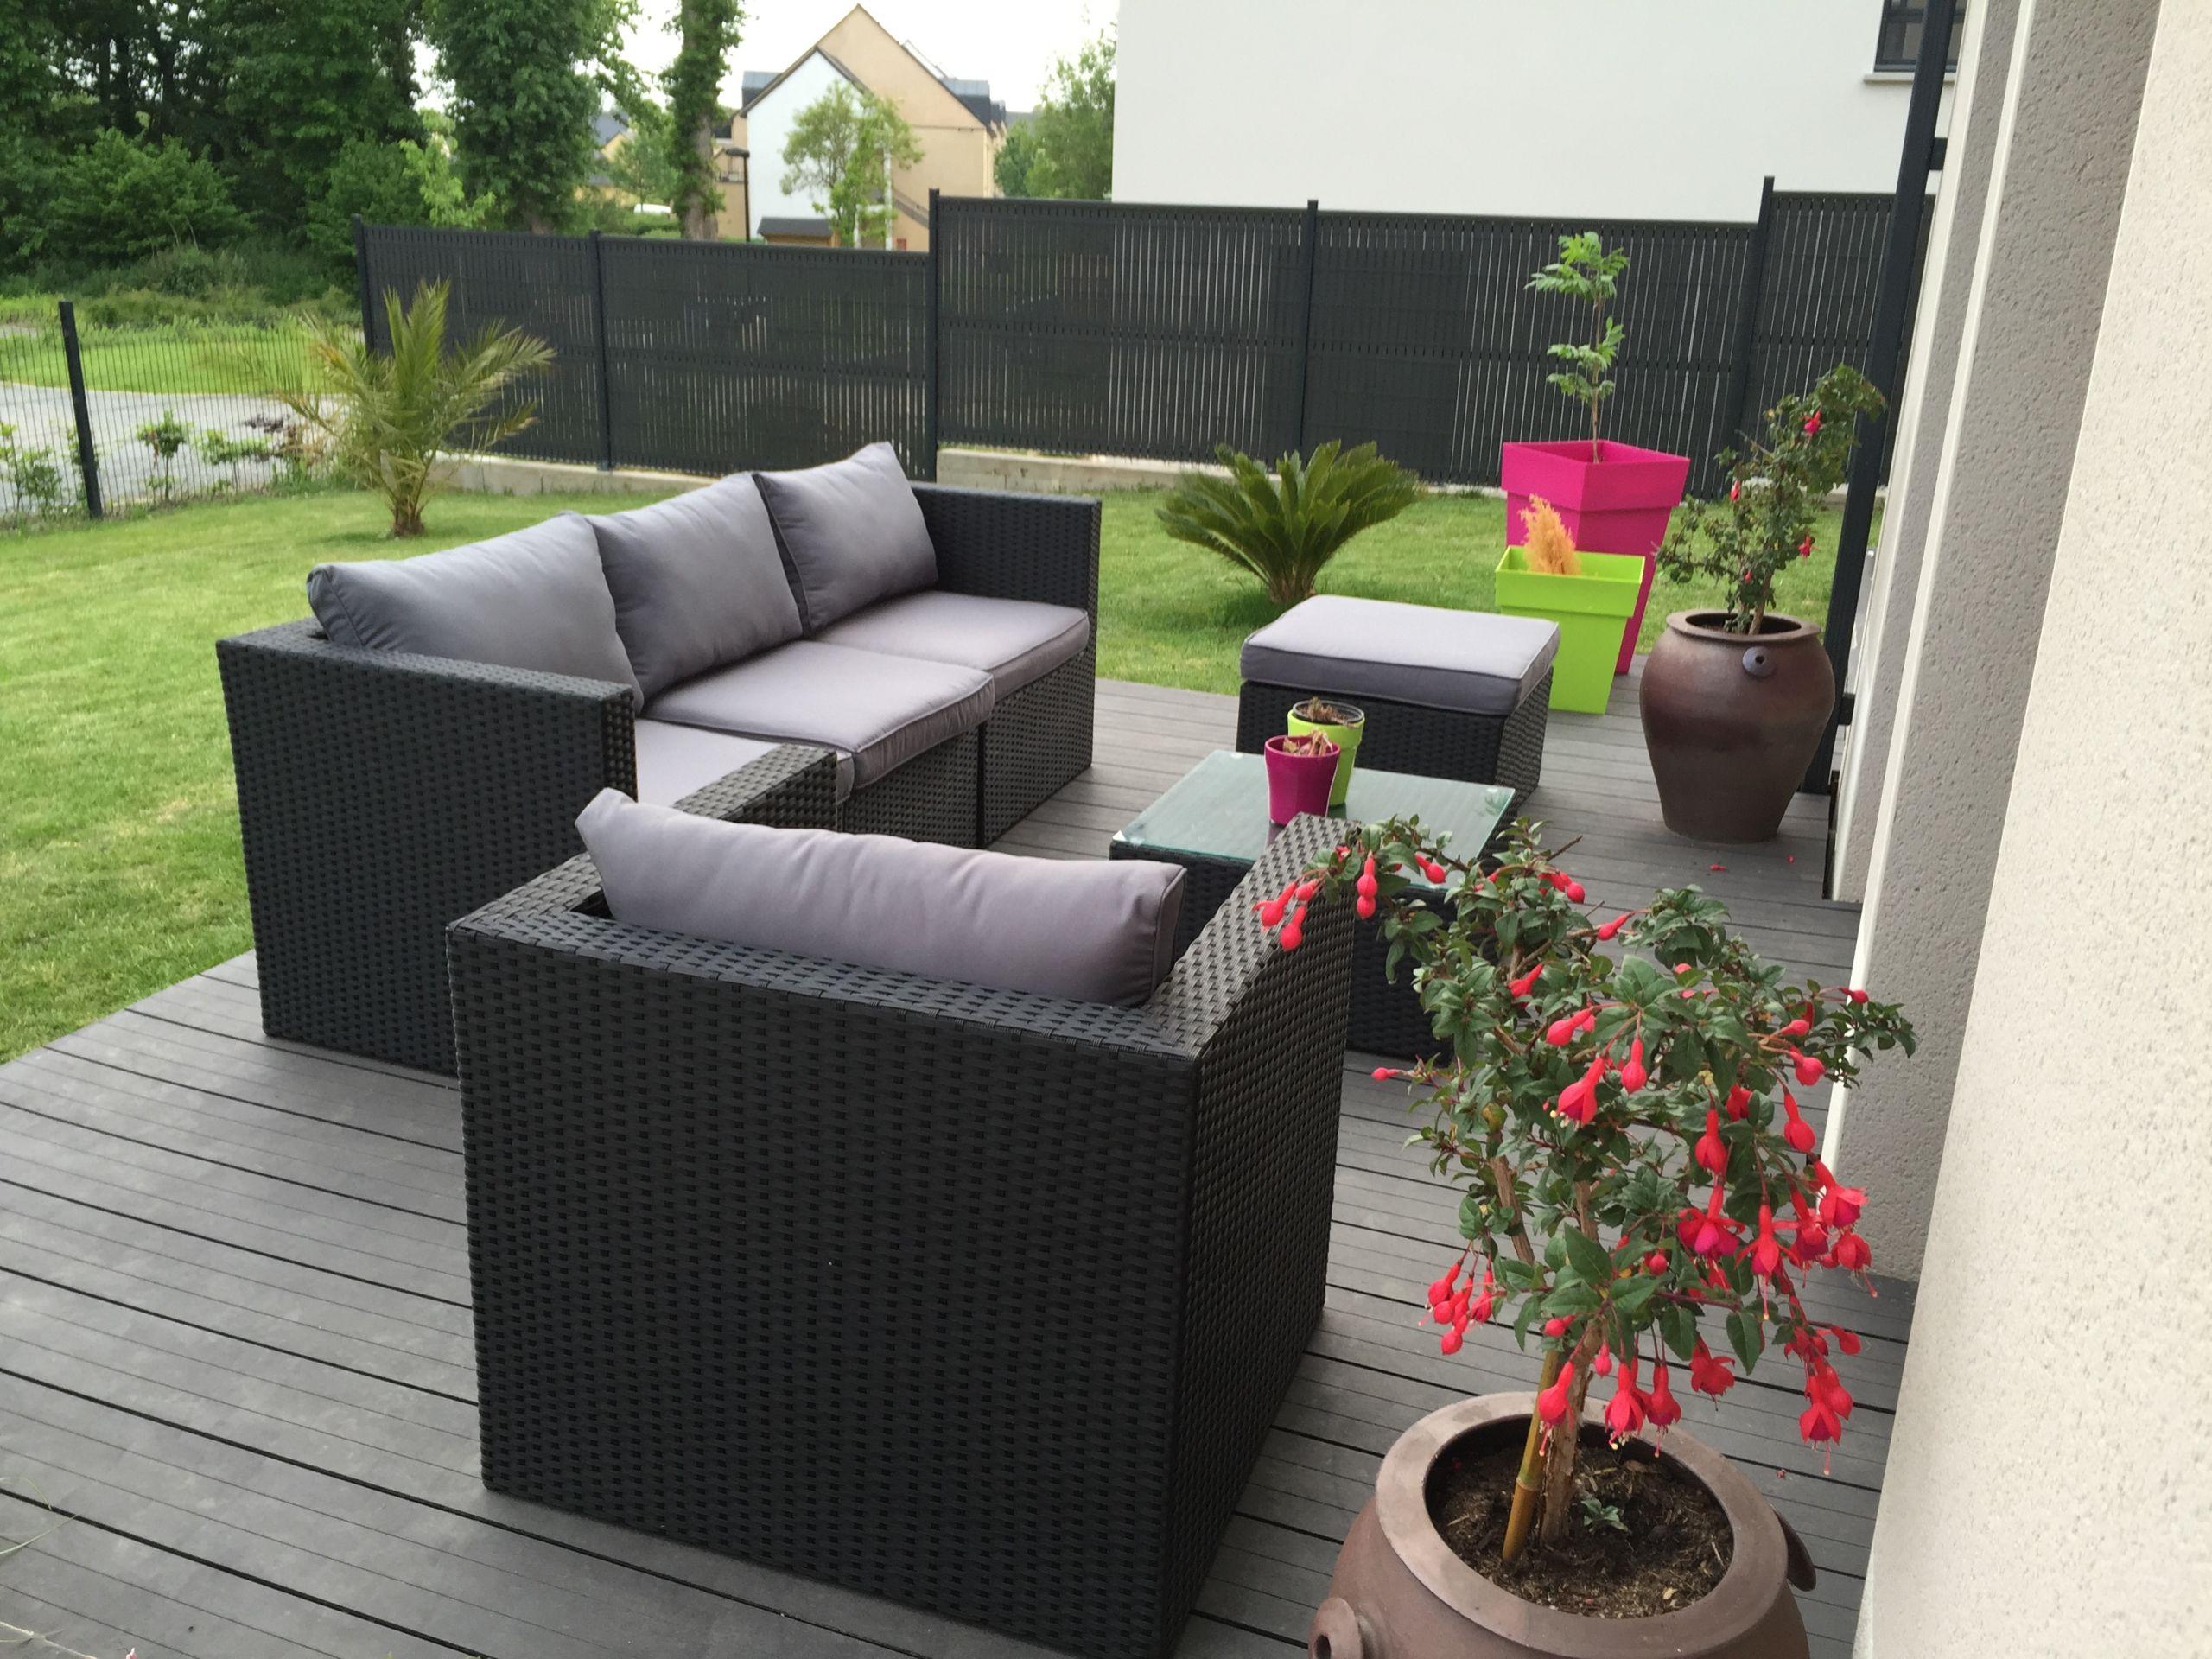 Table De Jardin Resine Luxe Dalle Terrasse Ikea | Salon Jardin pour Salon De Jardin Pas Cher Ikea